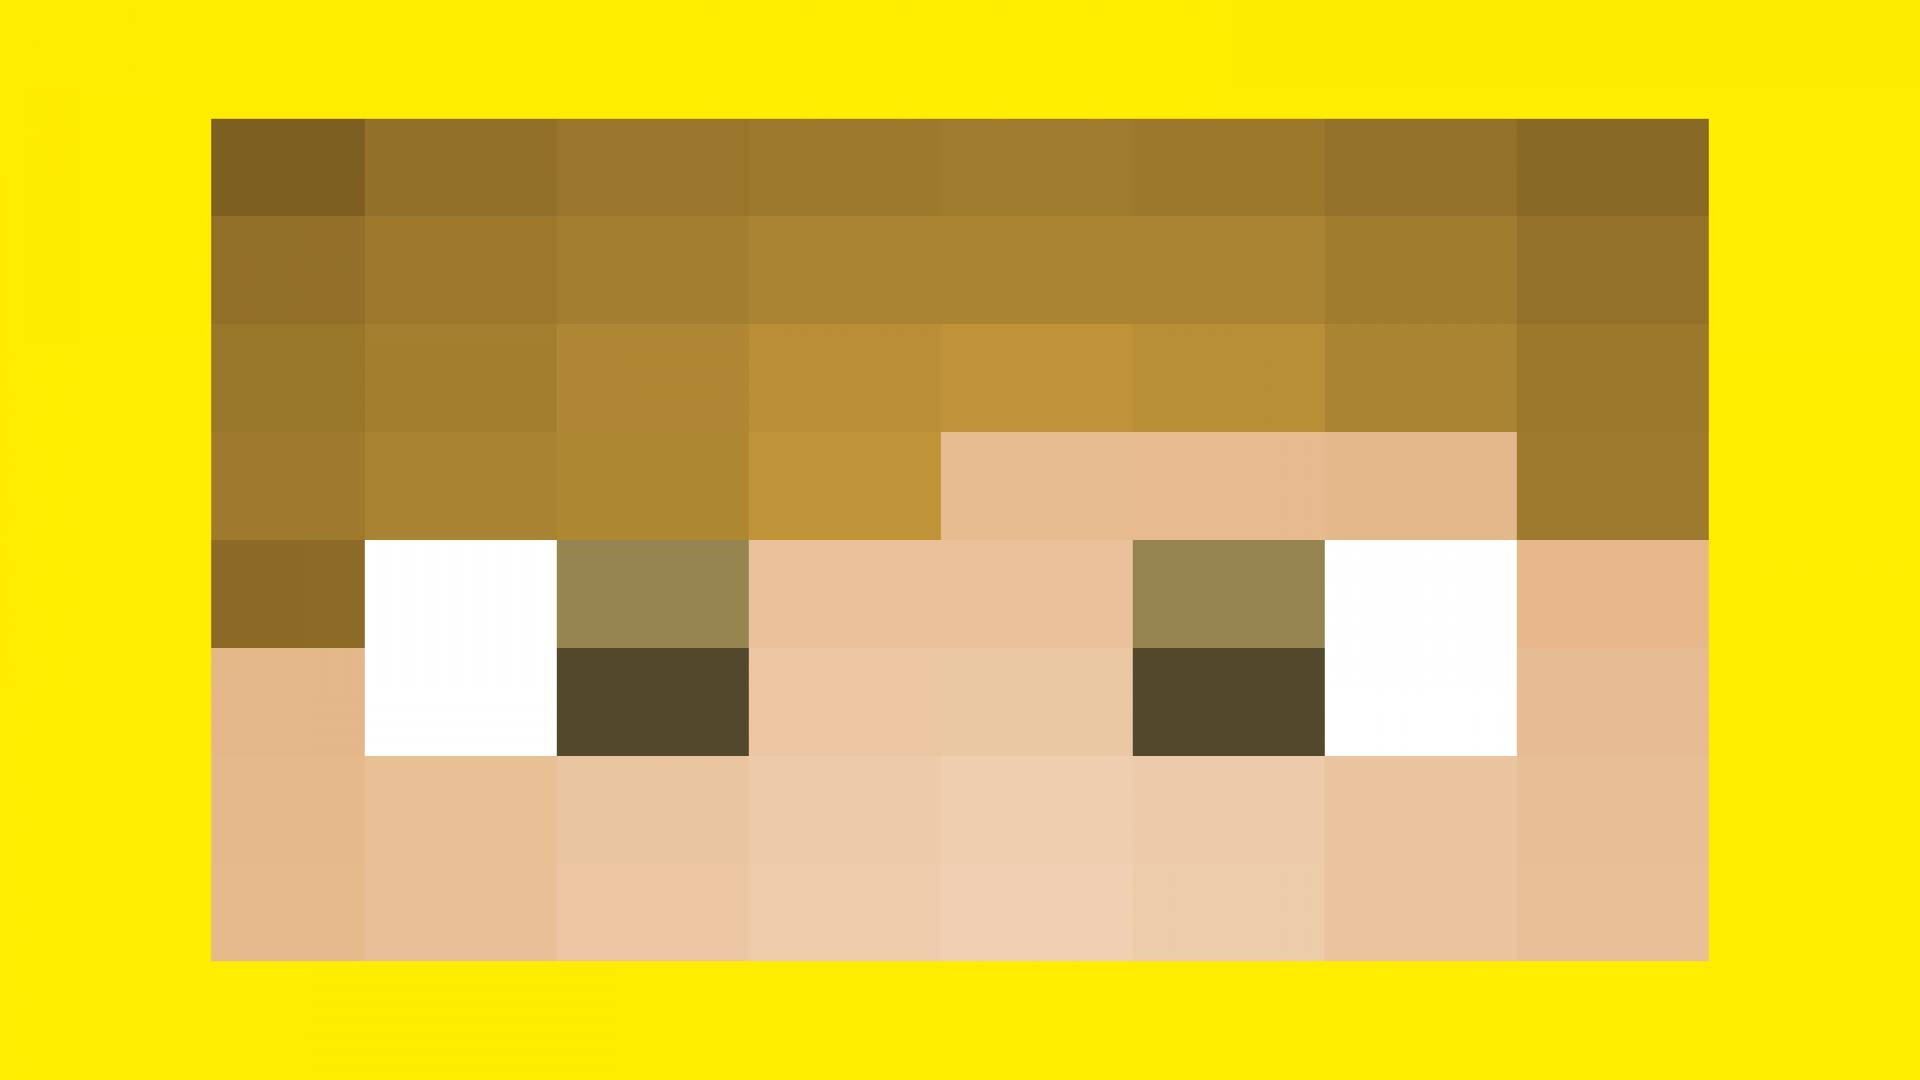 GoldenPack1.1